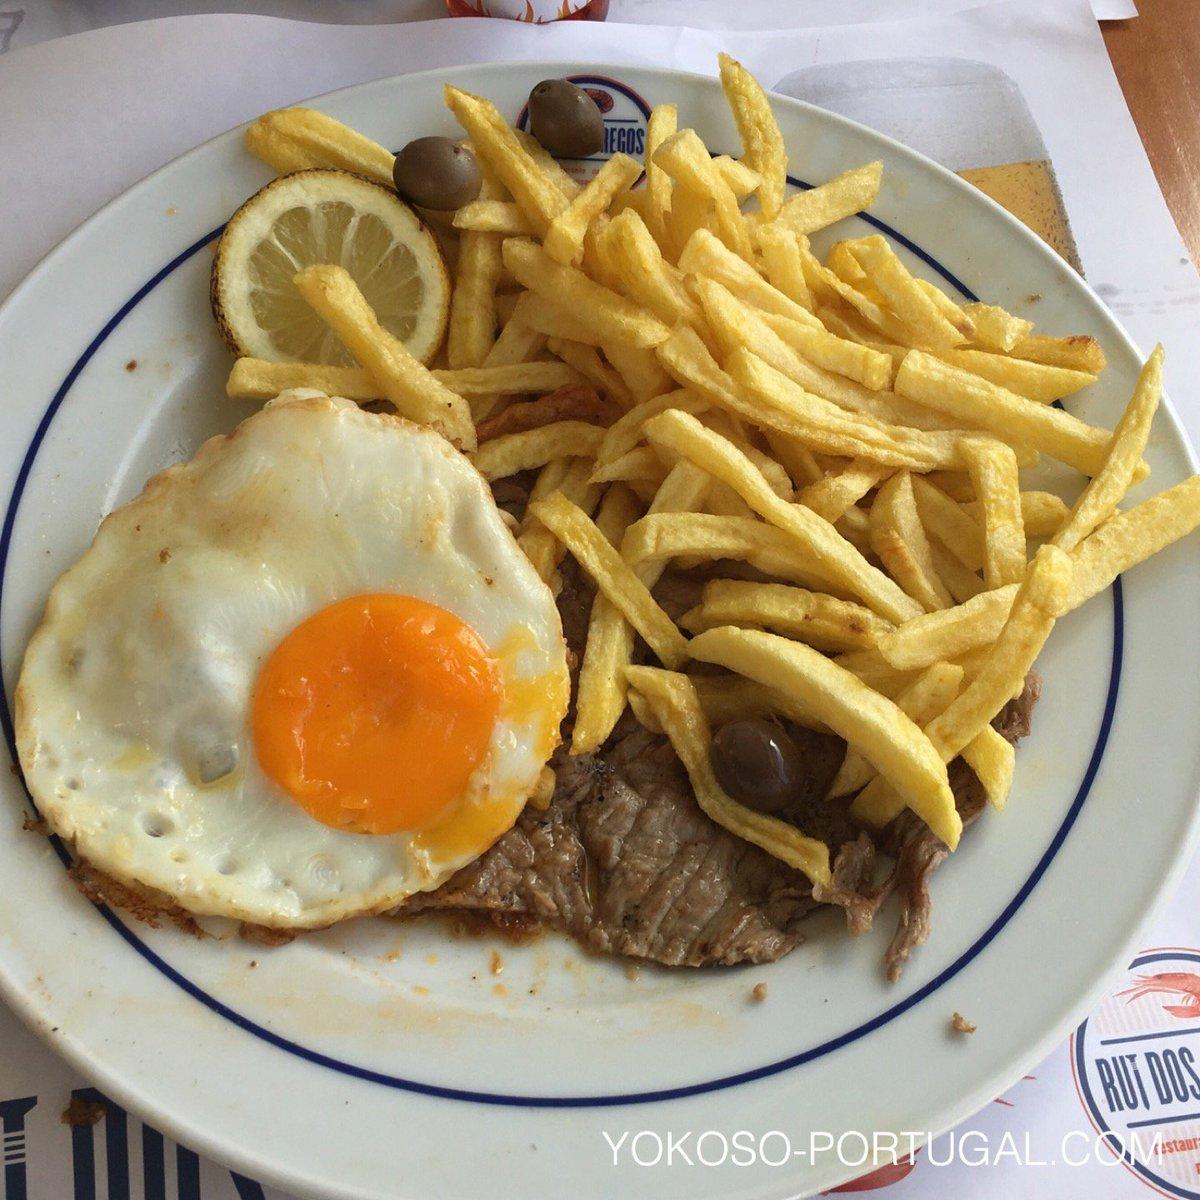 test ツイッターメディア - ポルトガル名物、薄切り牛肉のステーキ、プレゴ専門店です。安くて・早くて・旨いのお店です。 (@ Rui dos Pregos) https://t.co/Gbo9mUFA4q https://t.co/he3sOwmiD0